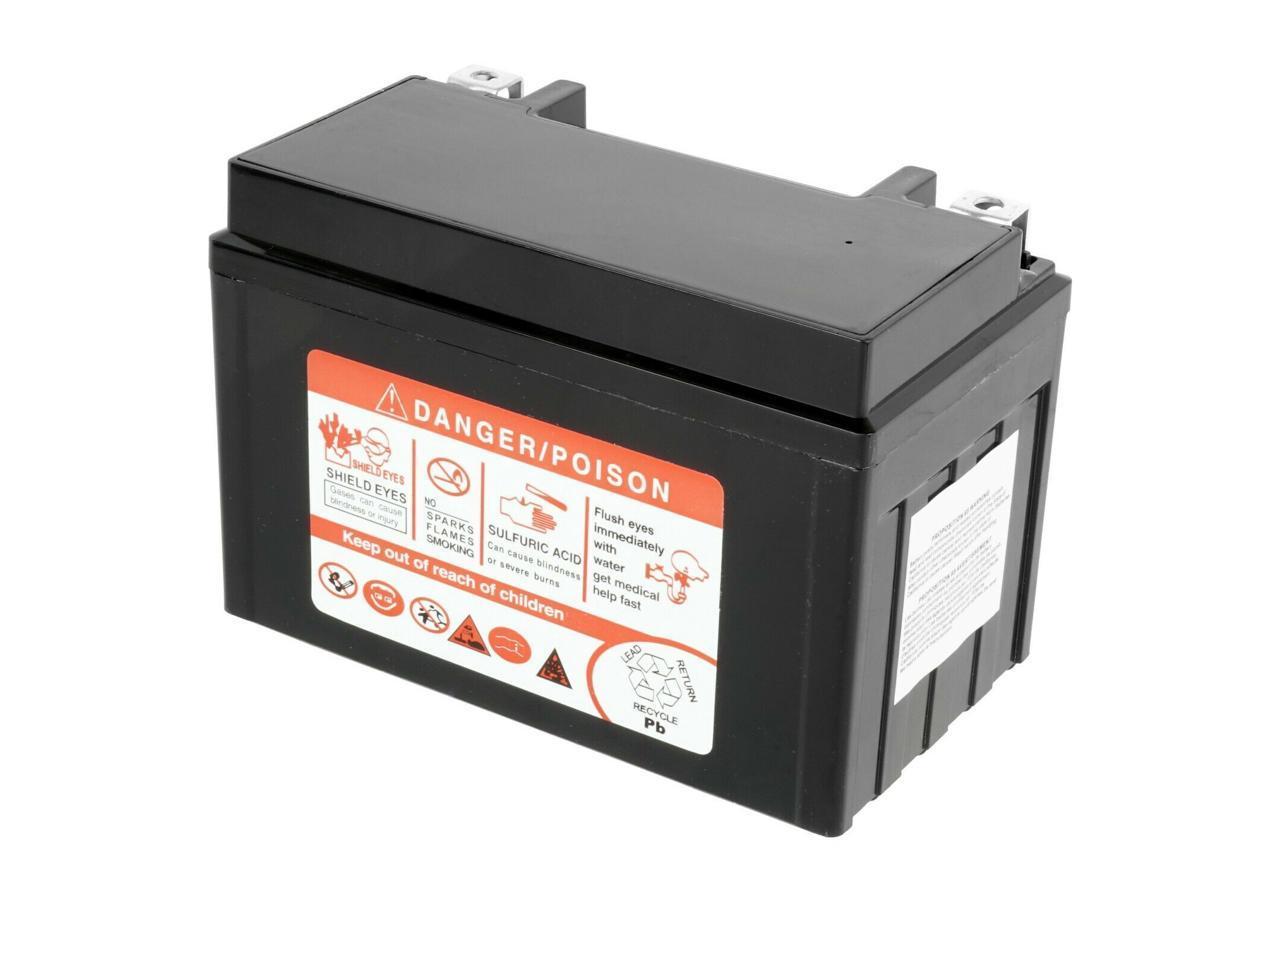 TR200 Fat Cat 200 1986 Caltric AGM Battery for Honda NT650 Hawk 650 1988-1991